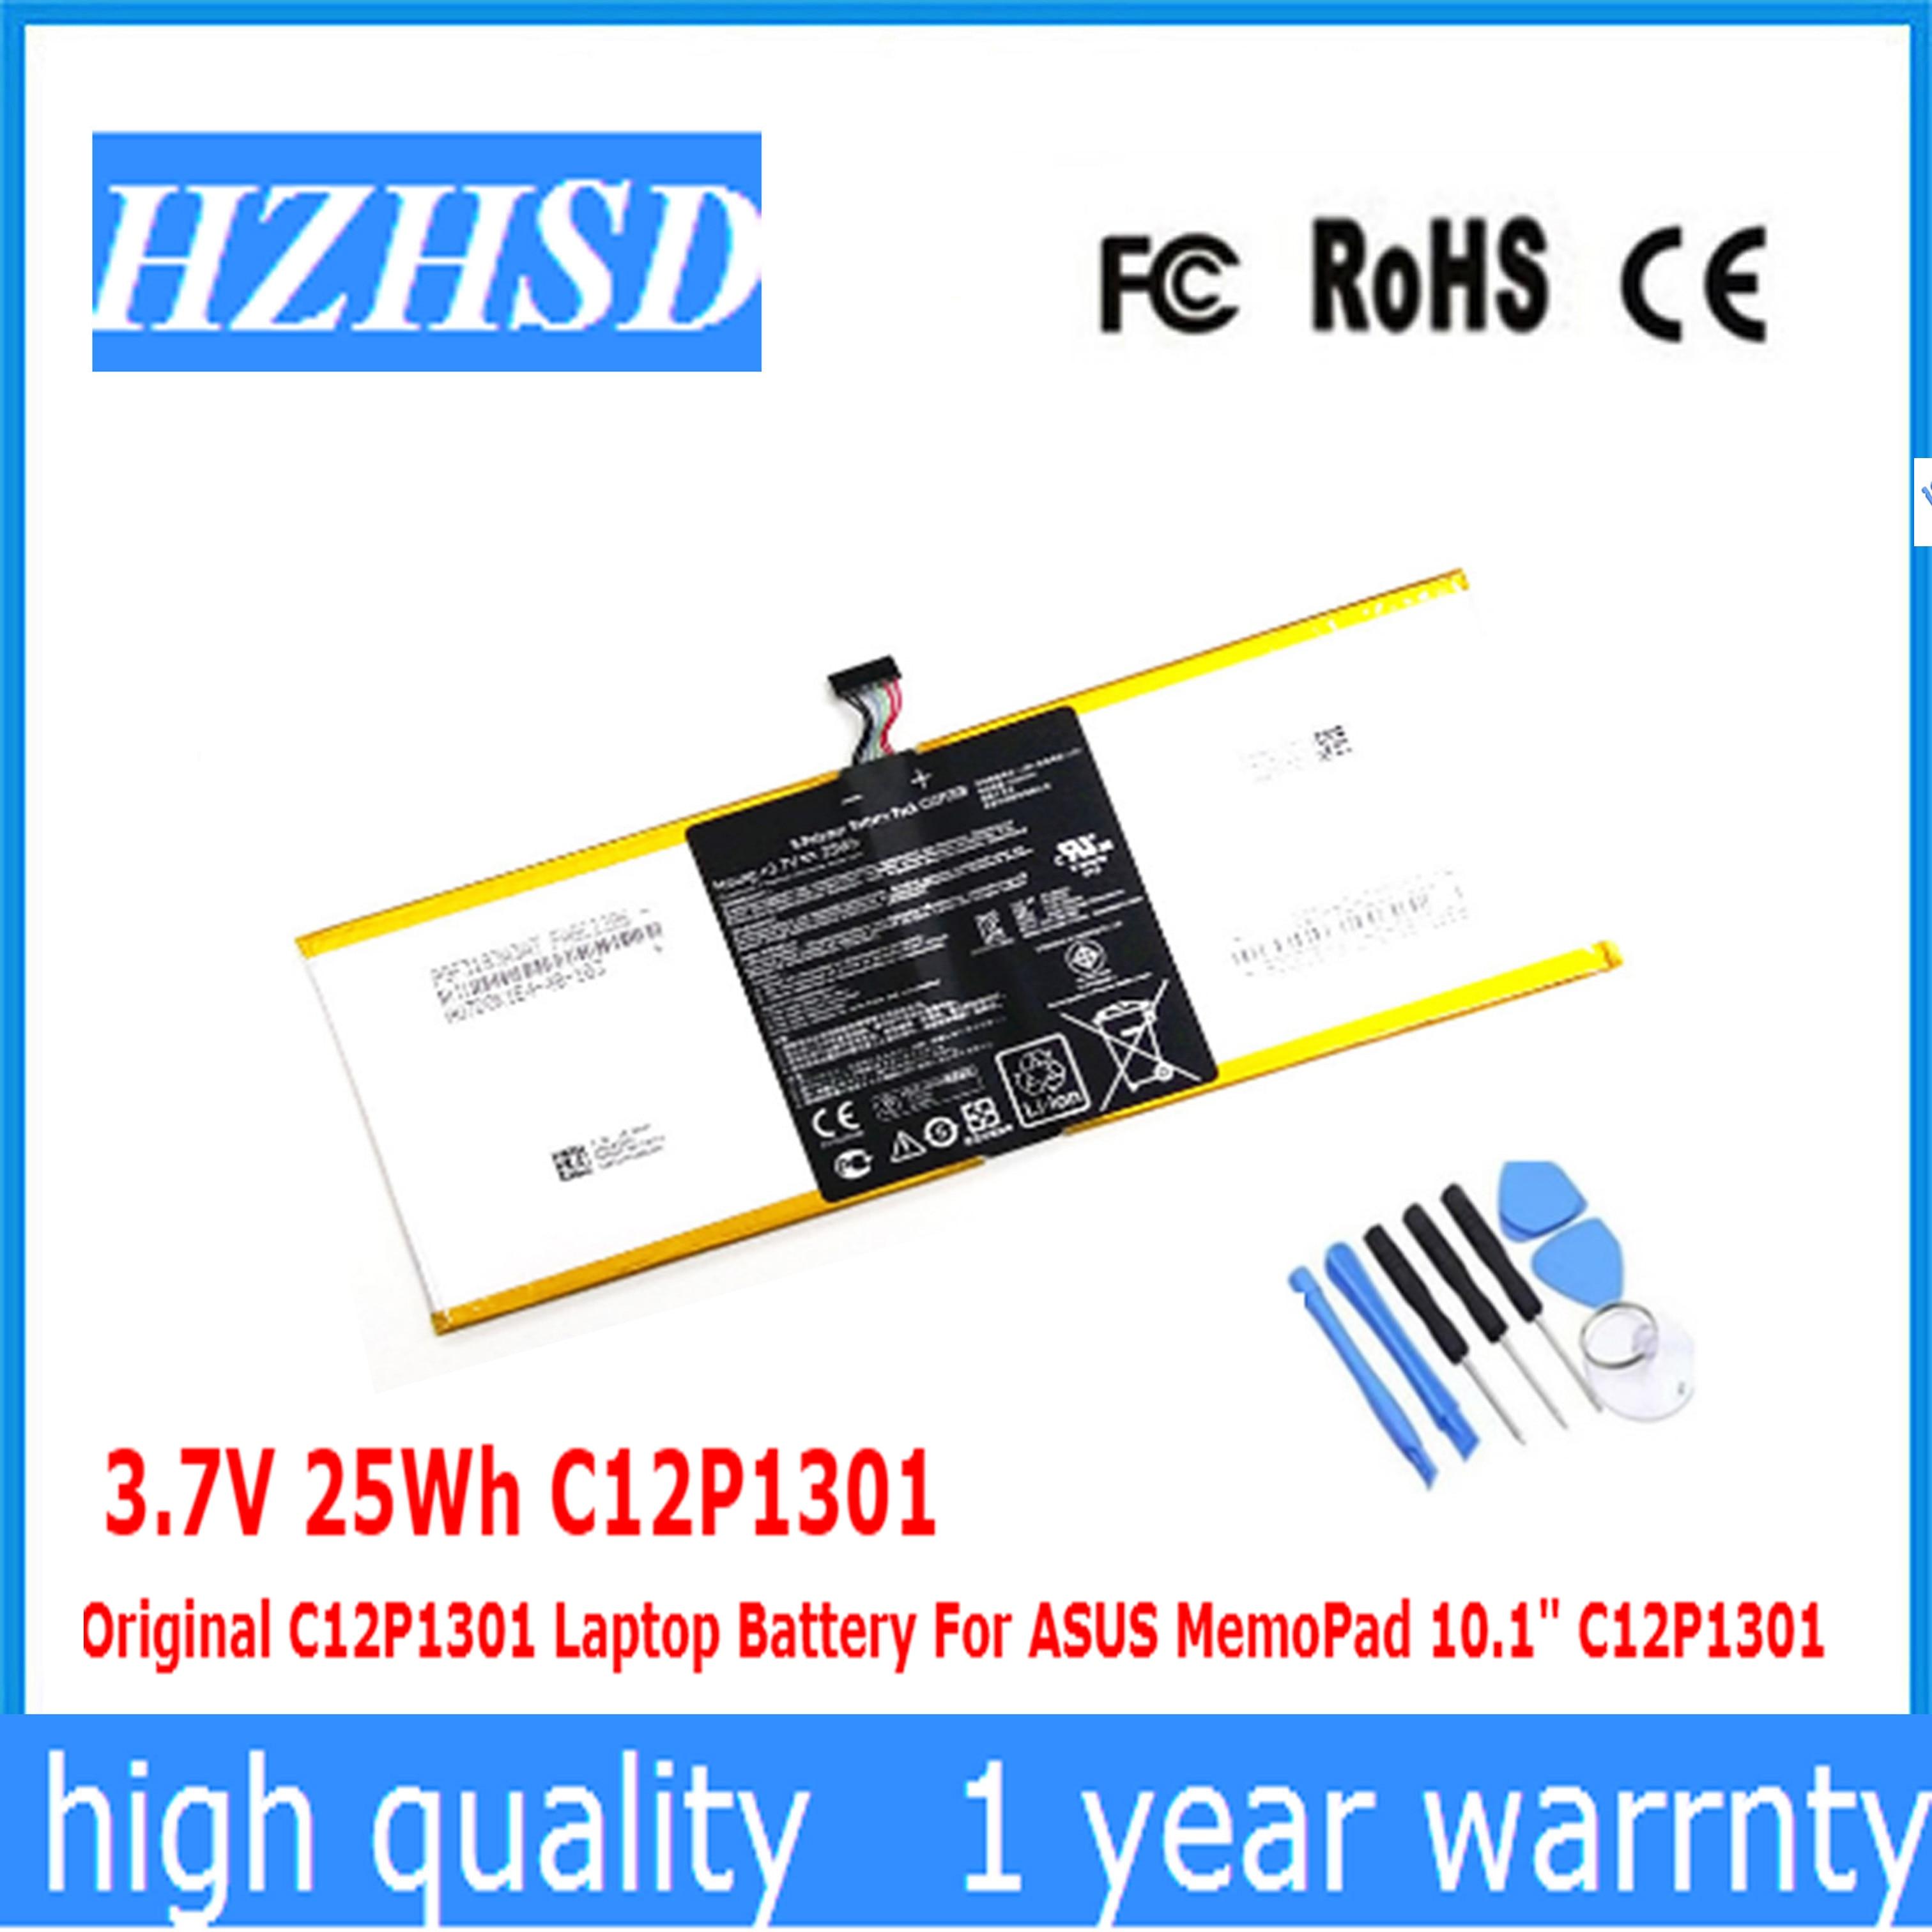 3.7V 25Wh C12P1301 Original C12P1301 Laptop Battery For ASUS MemoPad 10.1